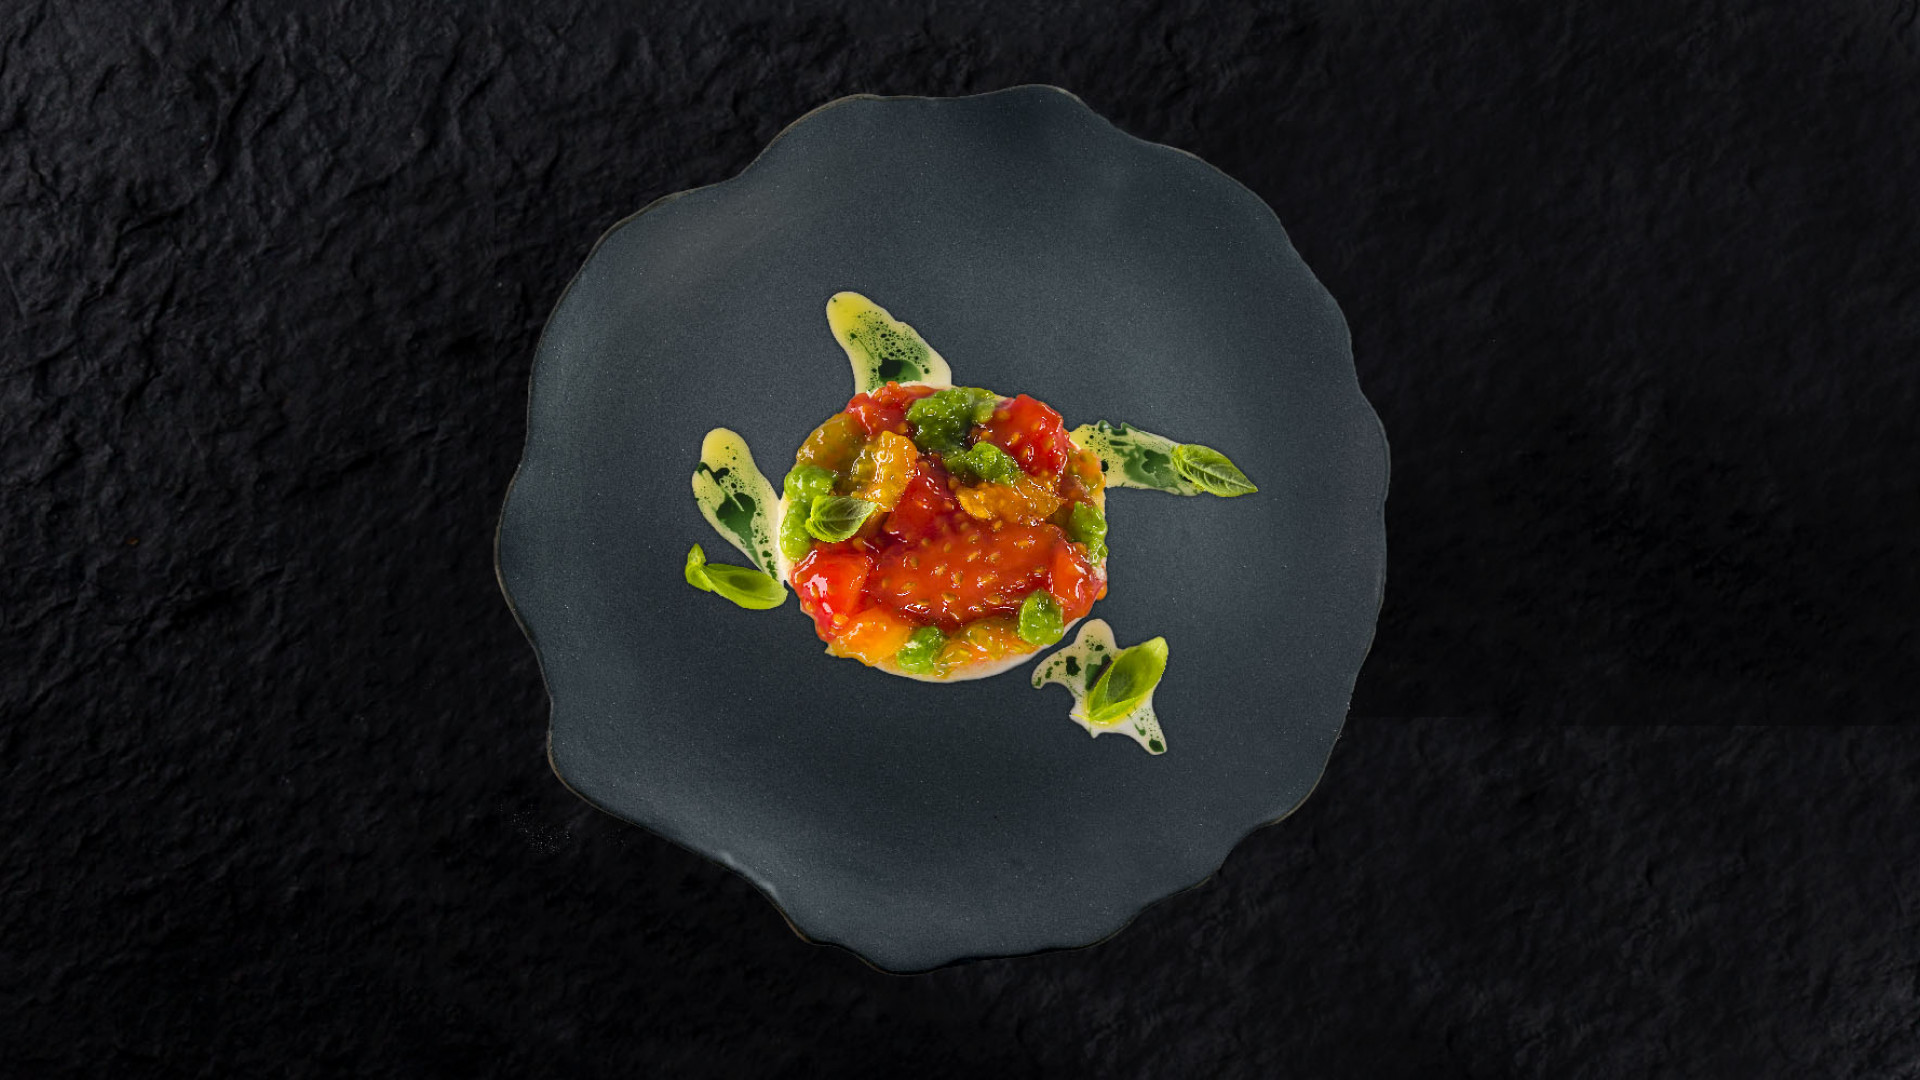 Tomato dish from Rigo